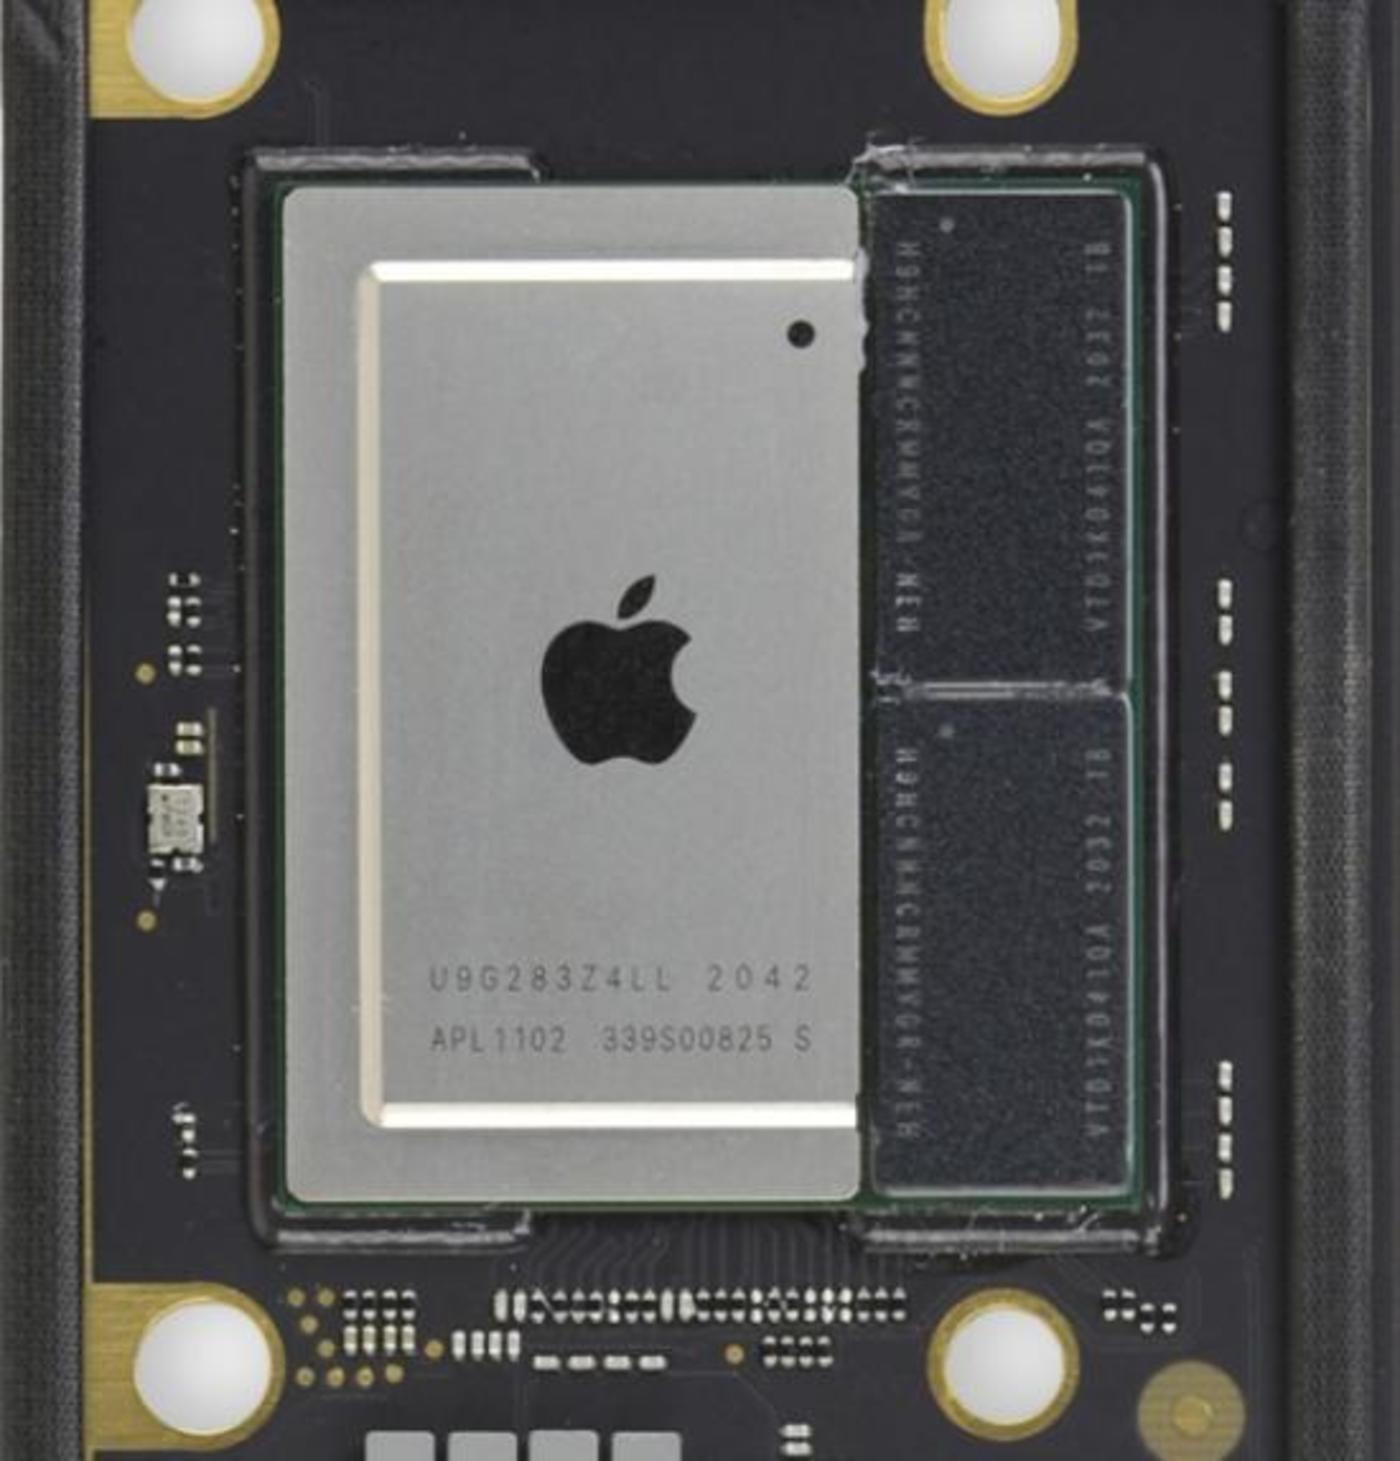 M1芯片拆解图,左侧为各部分集成,右侧为2x 4 GB的内存